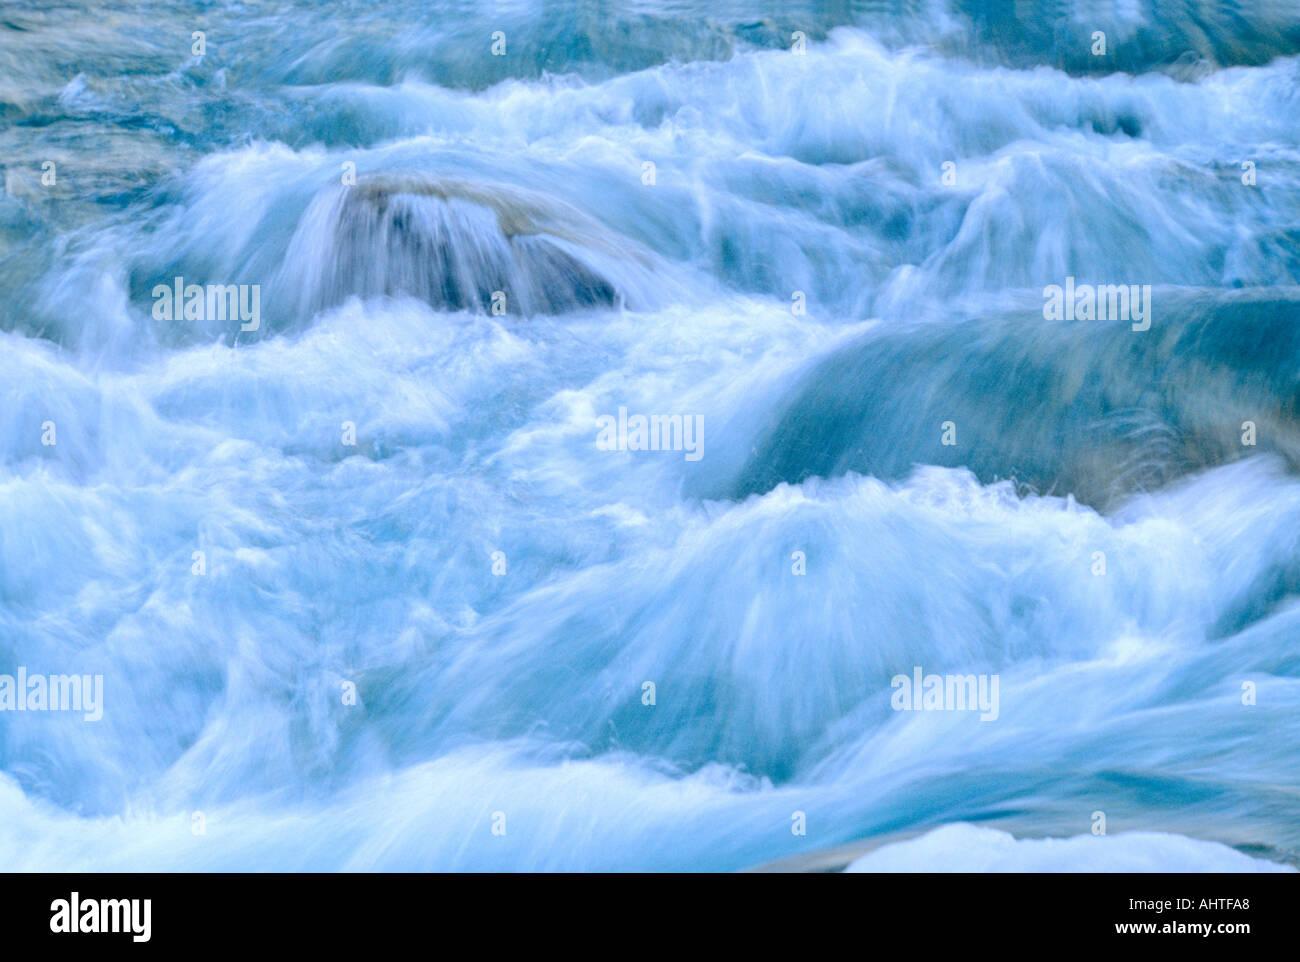 Rushing Water - Stock Image